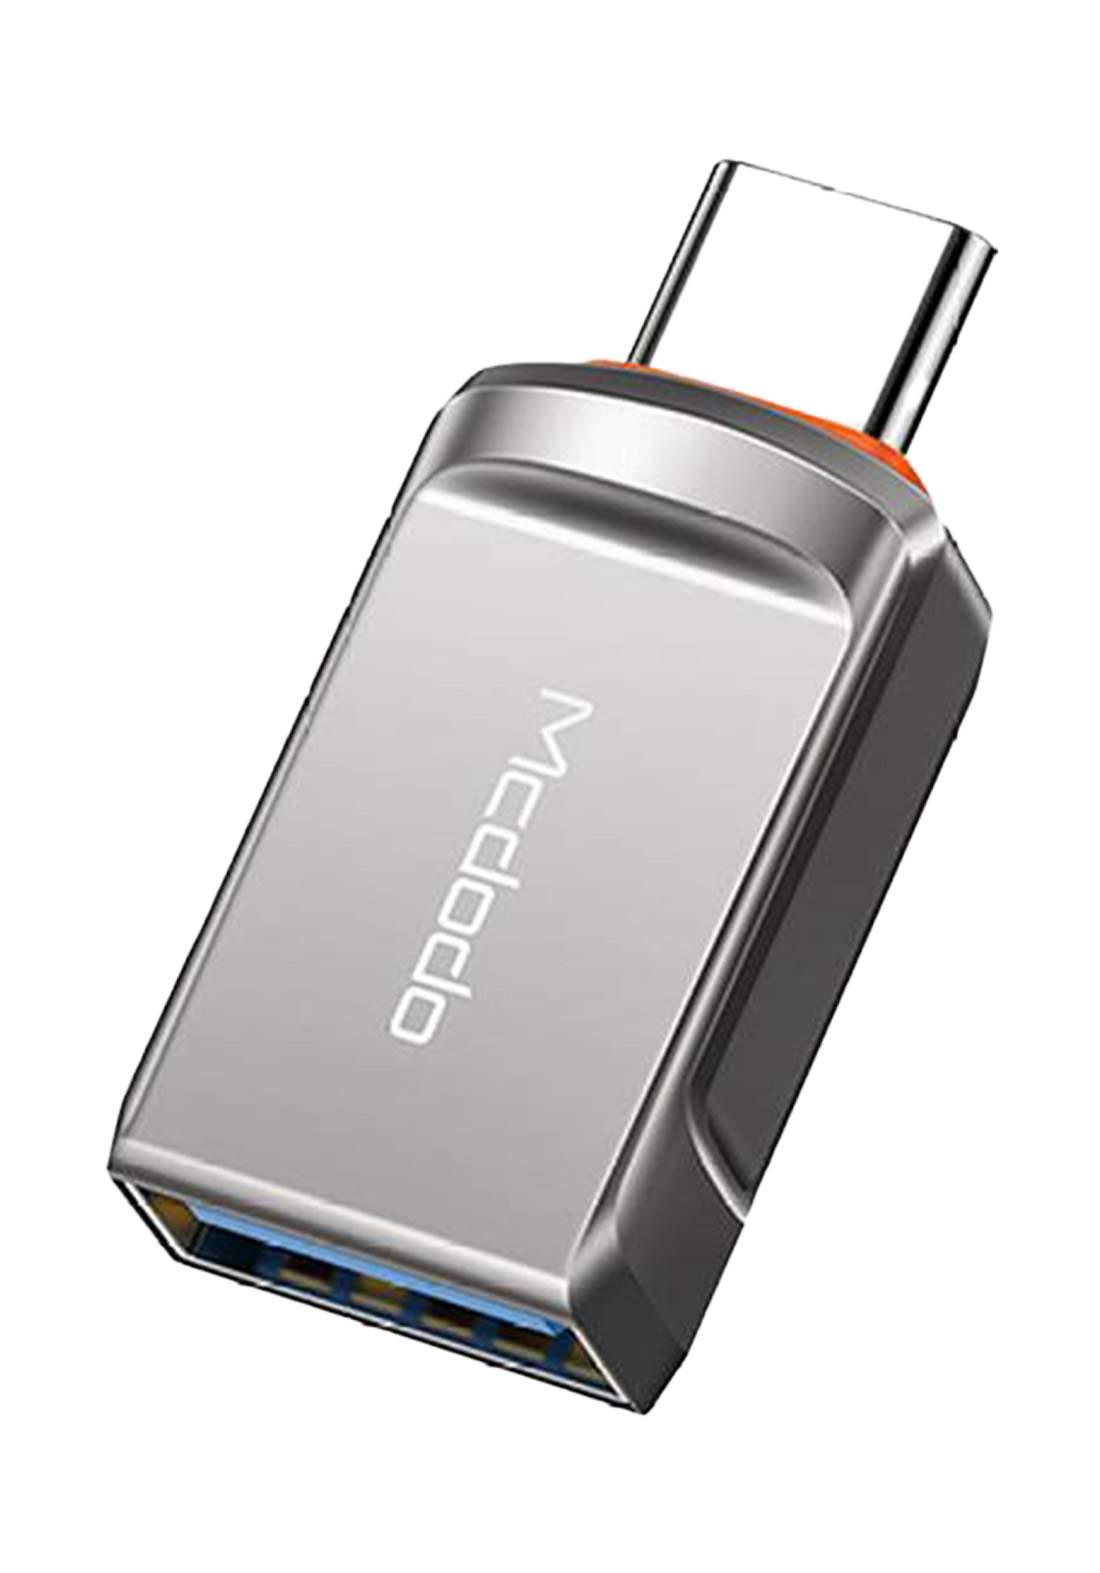 Mcdodo OTG USB-A 3.0 to Type-c   Adapter -Gray